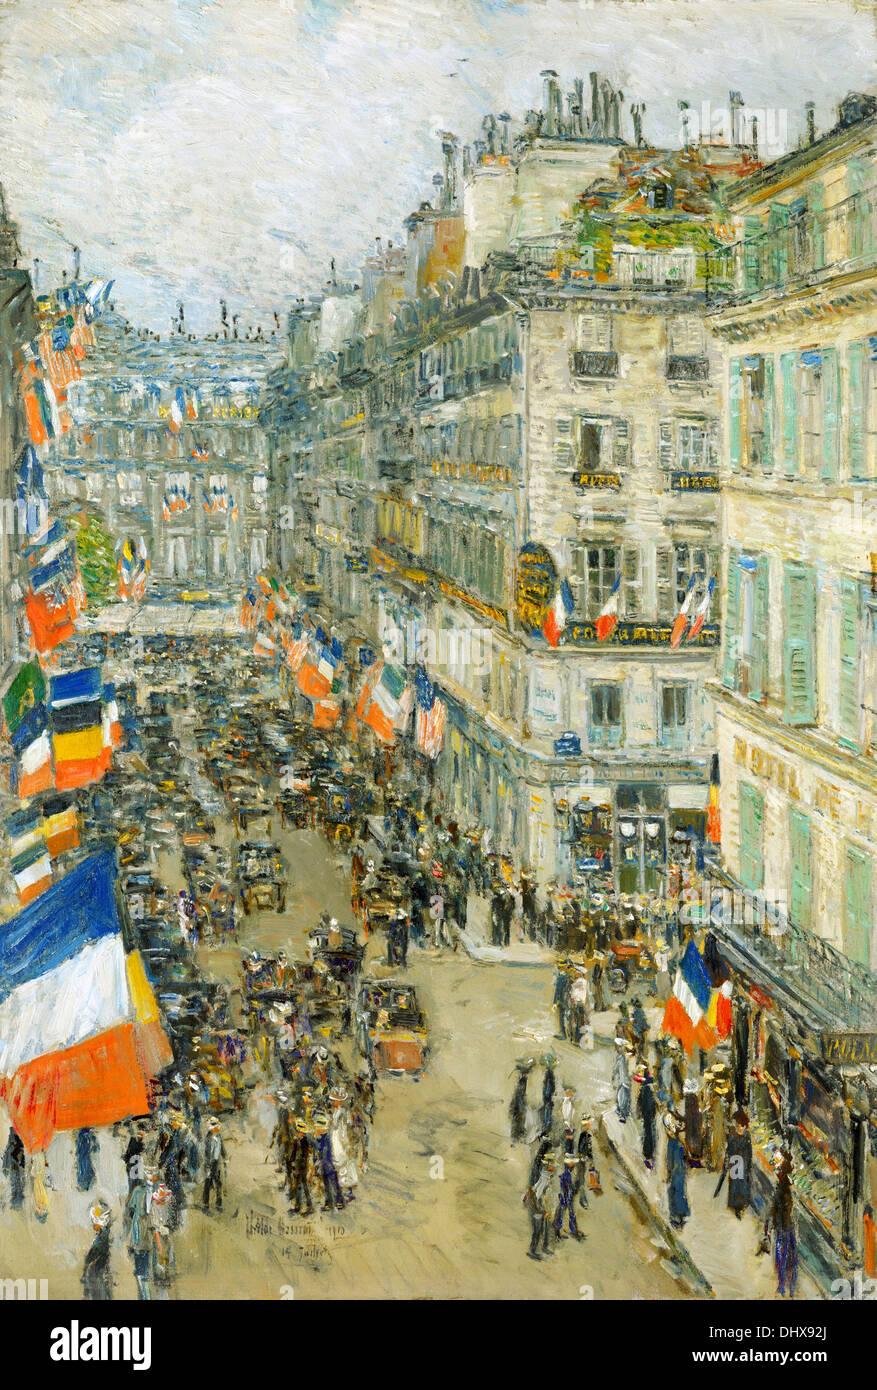 July Fourteenth, Rue Daunou - by Childe Hassam, 1910 - Stock Image